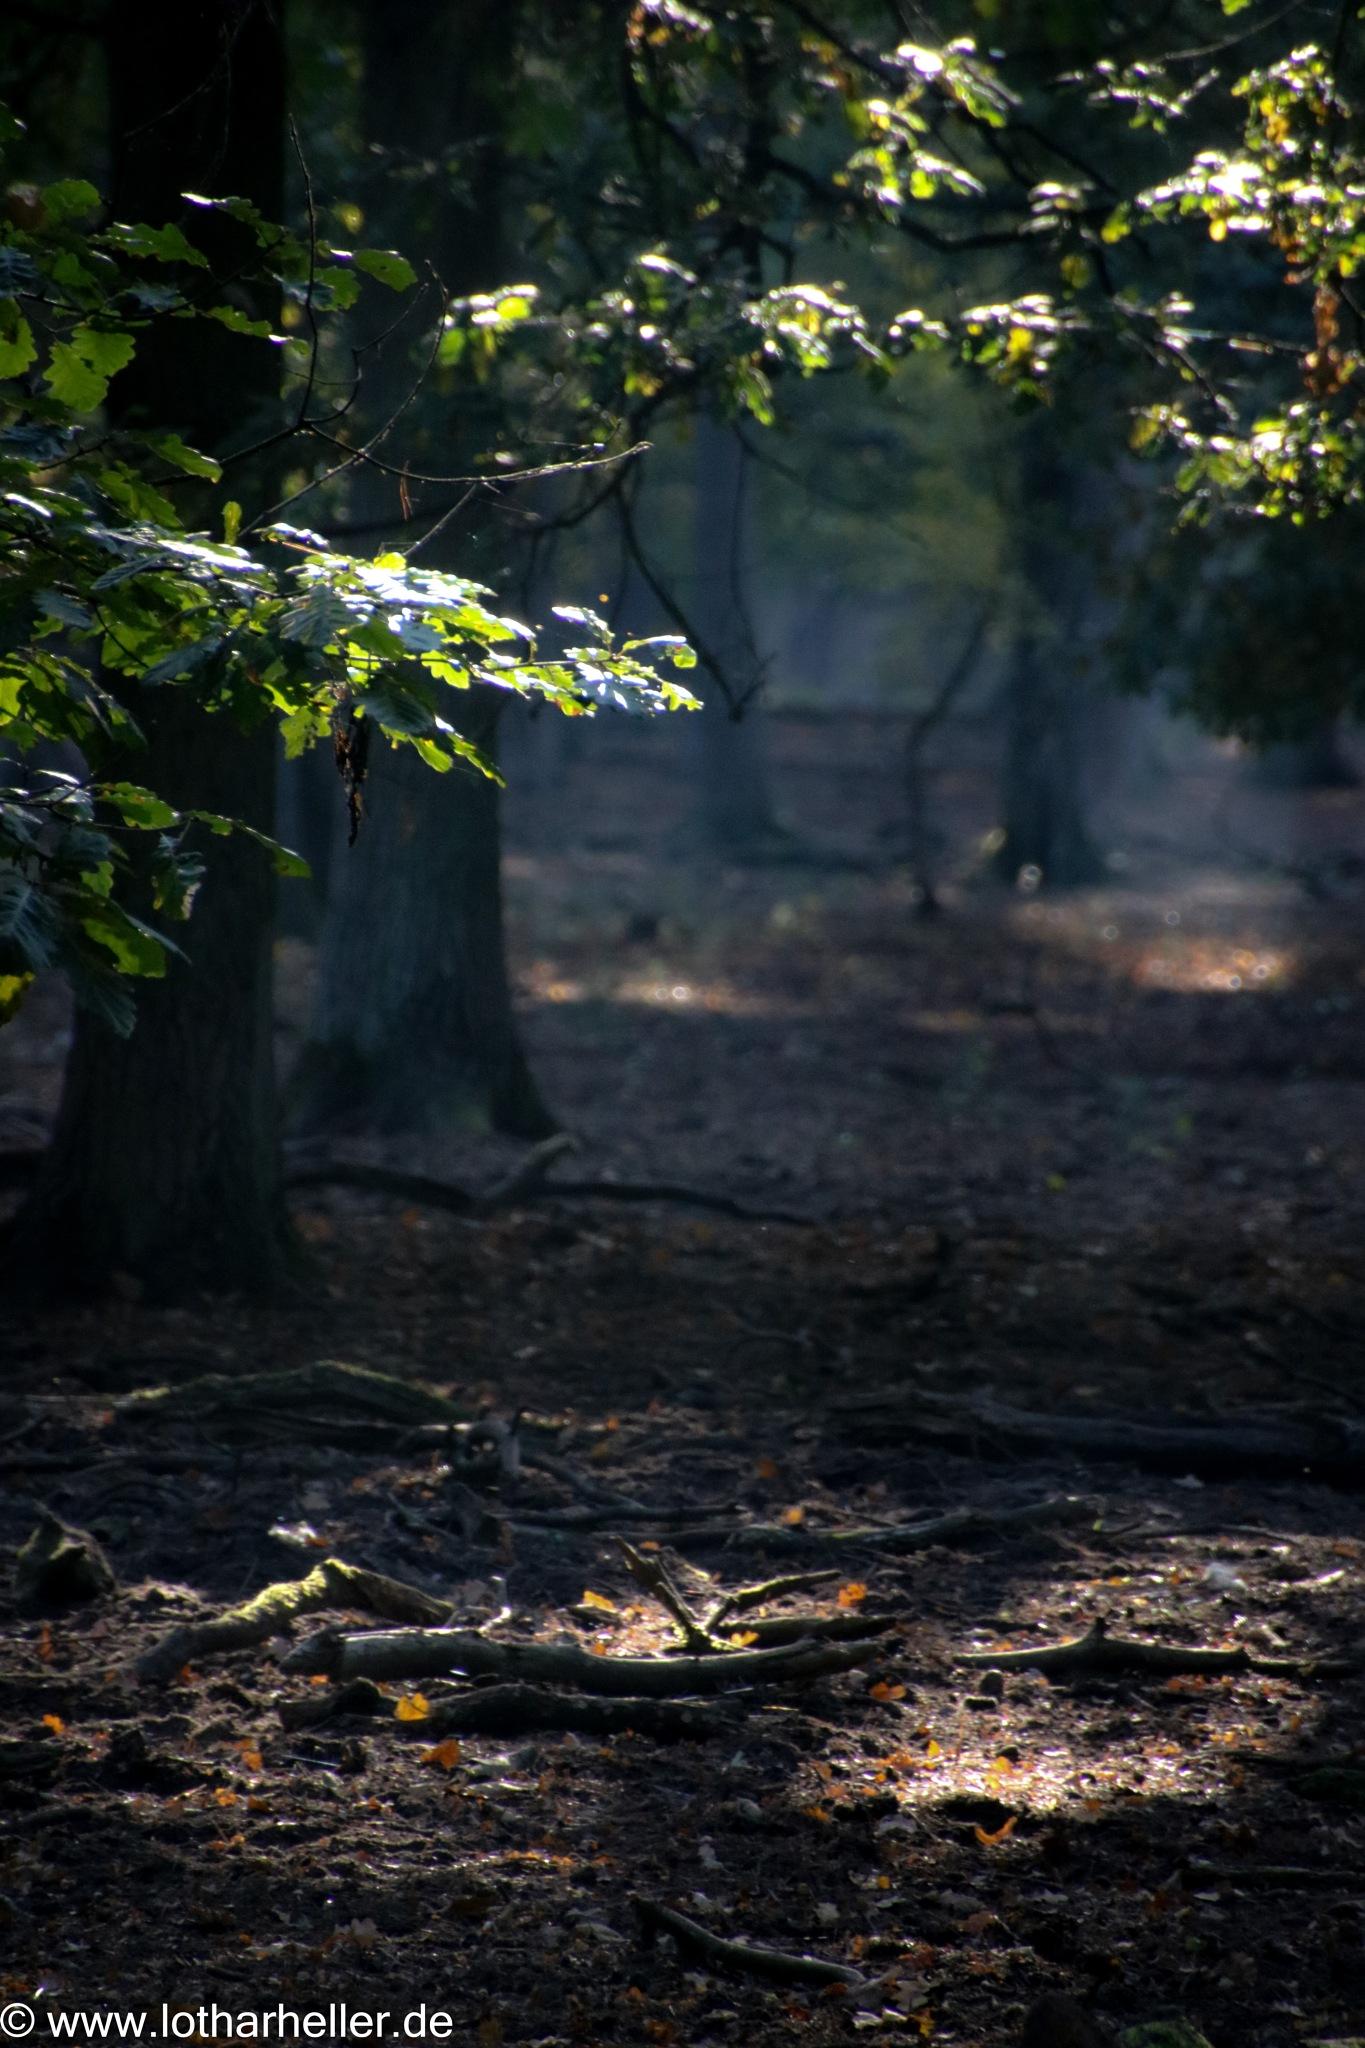 Forest Light by Lothar Heller